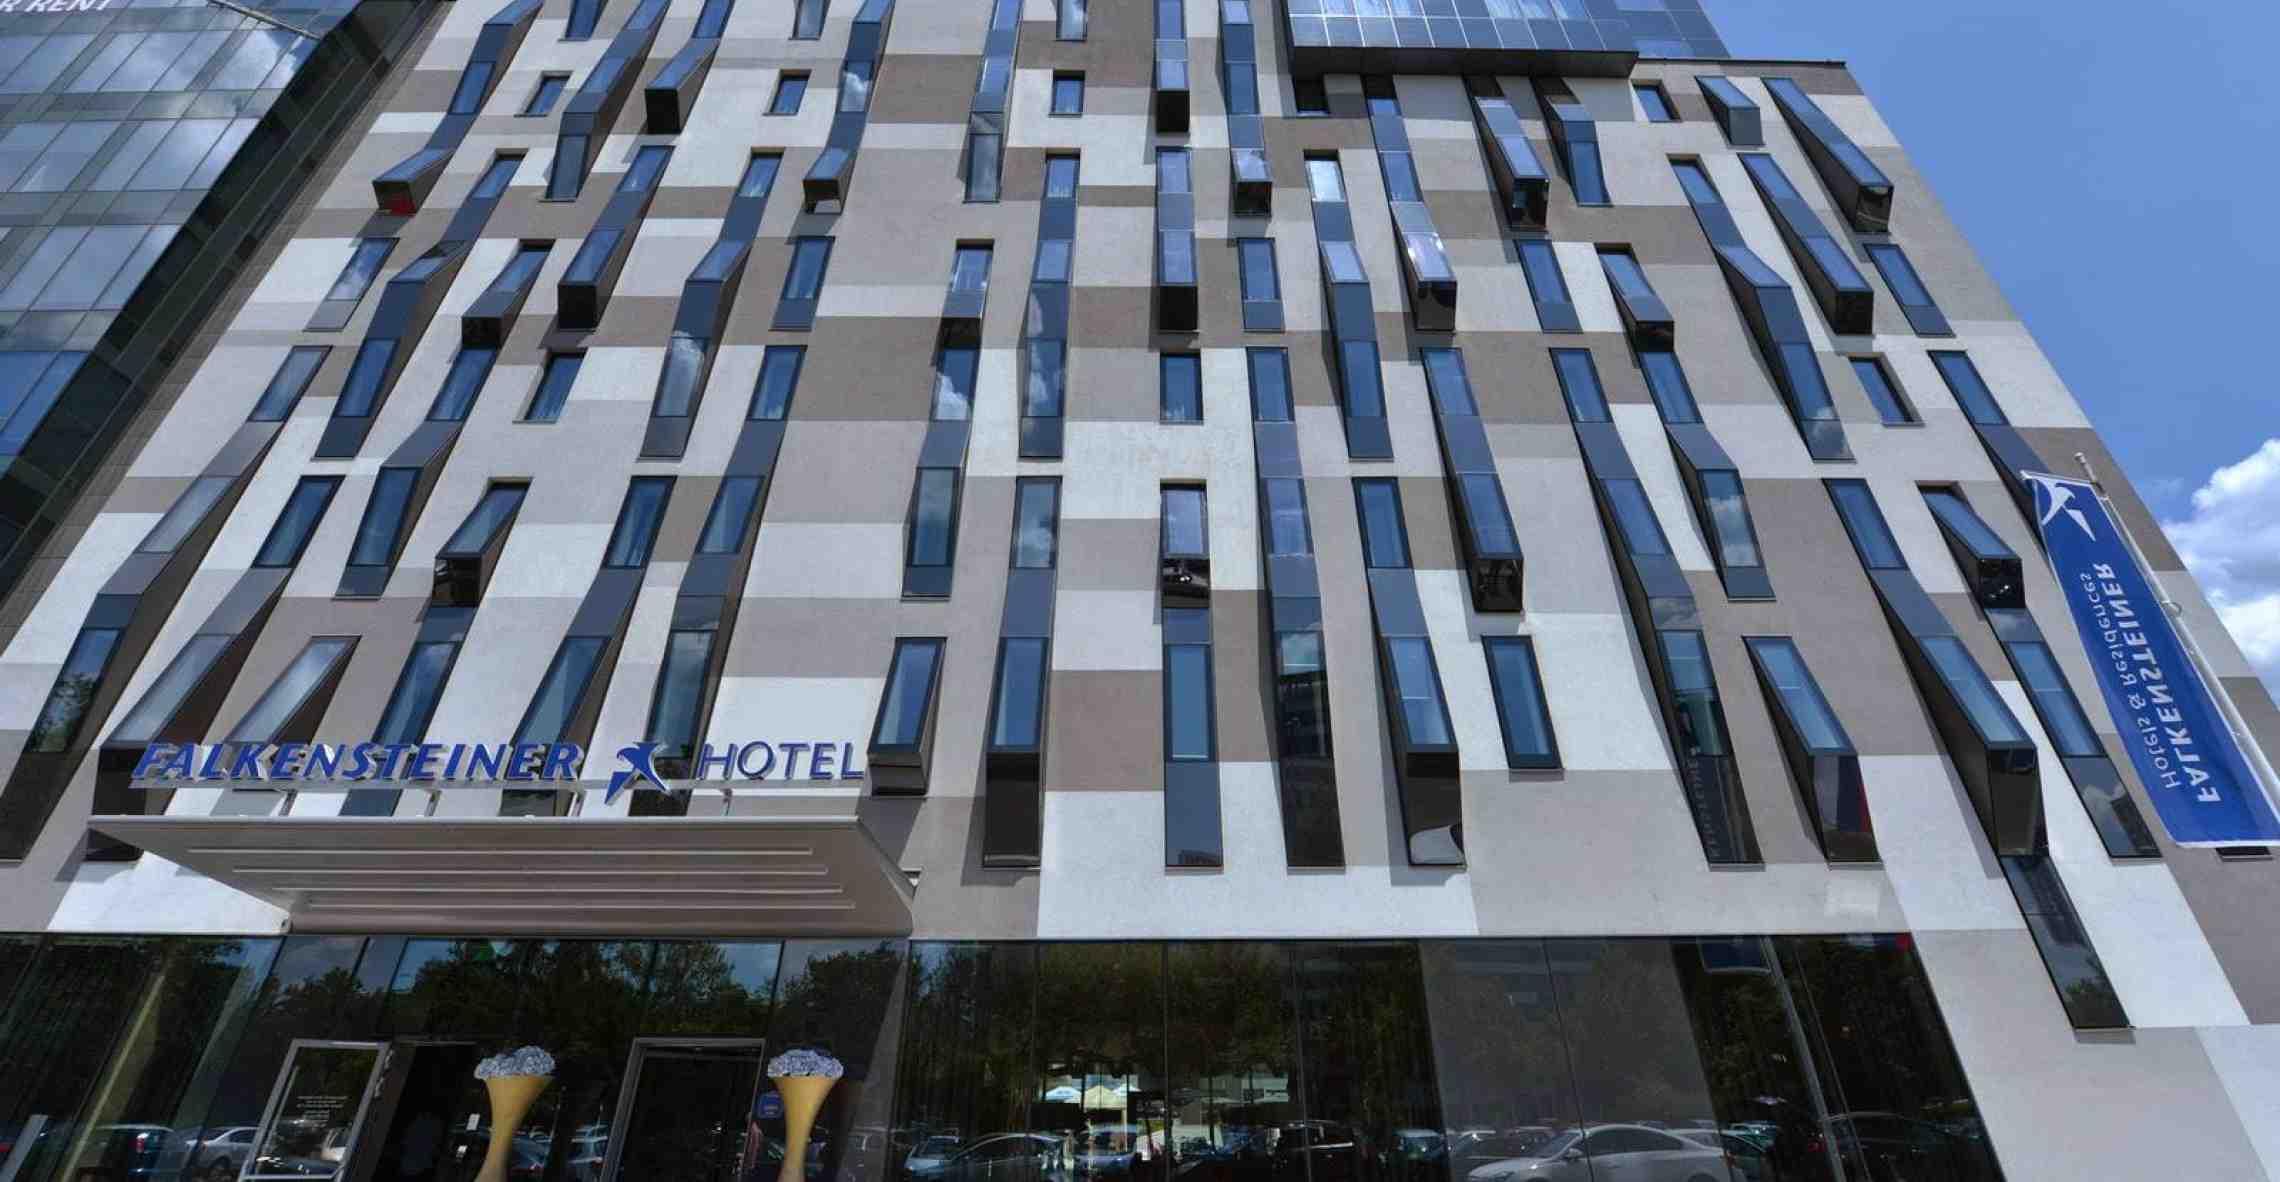 Falkensteiner hotel Beograd